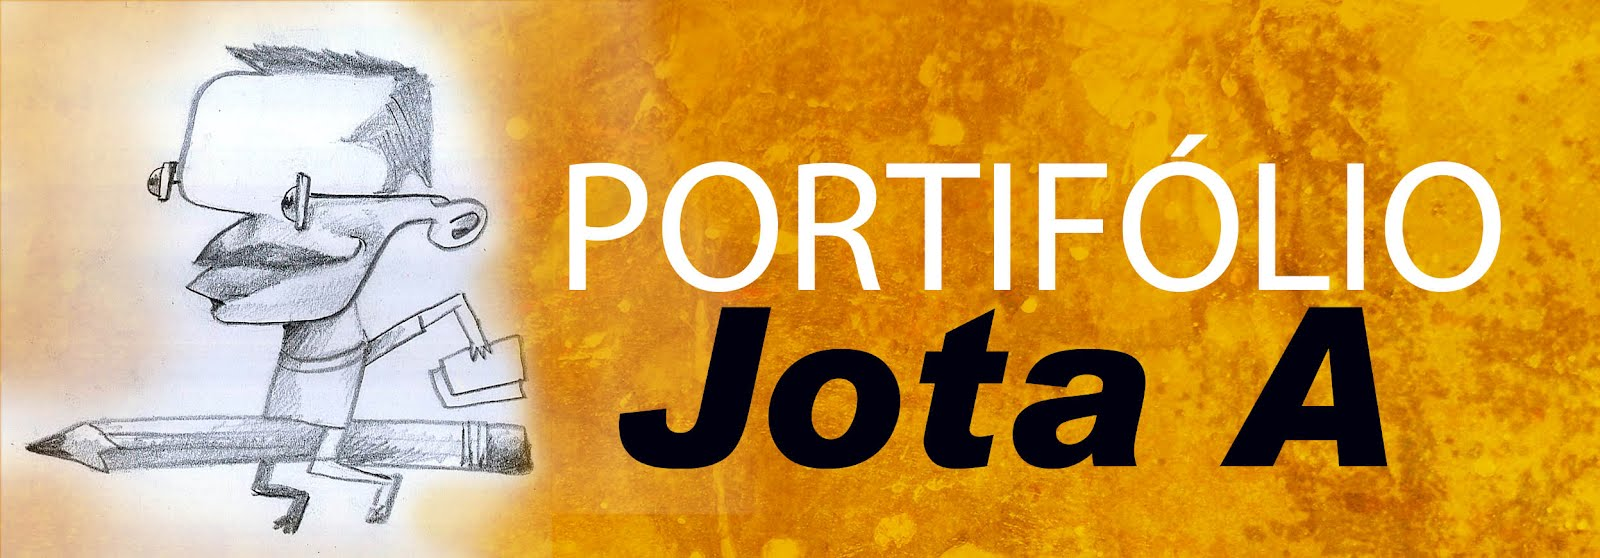 PORTIFOLIO JOTAA